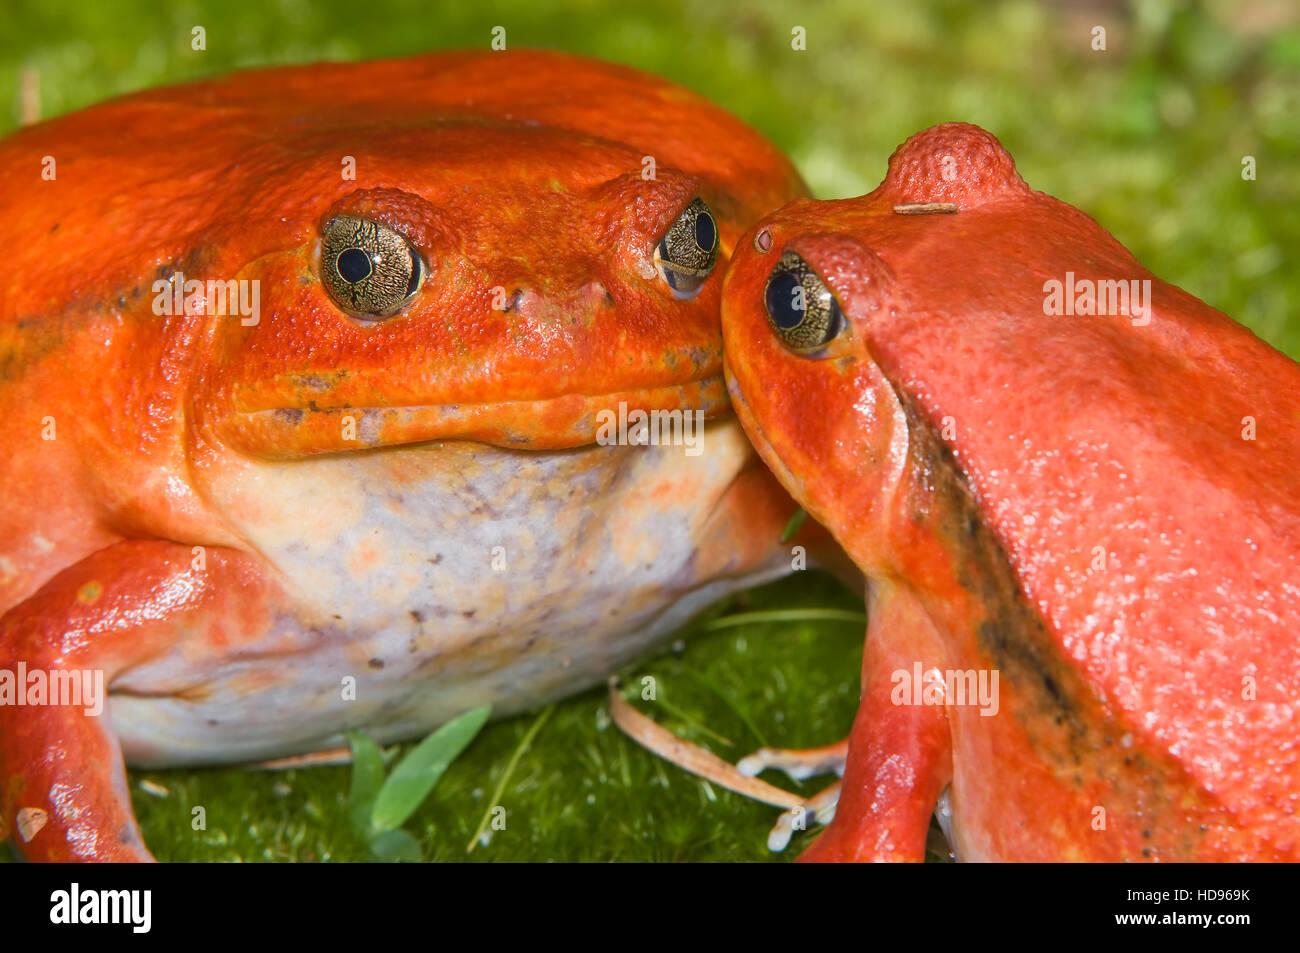 Couple of Tomato Frogs or Crapaud Rouge de Madagascar (Dyscophus antongilii), Madagascar - Stock Image